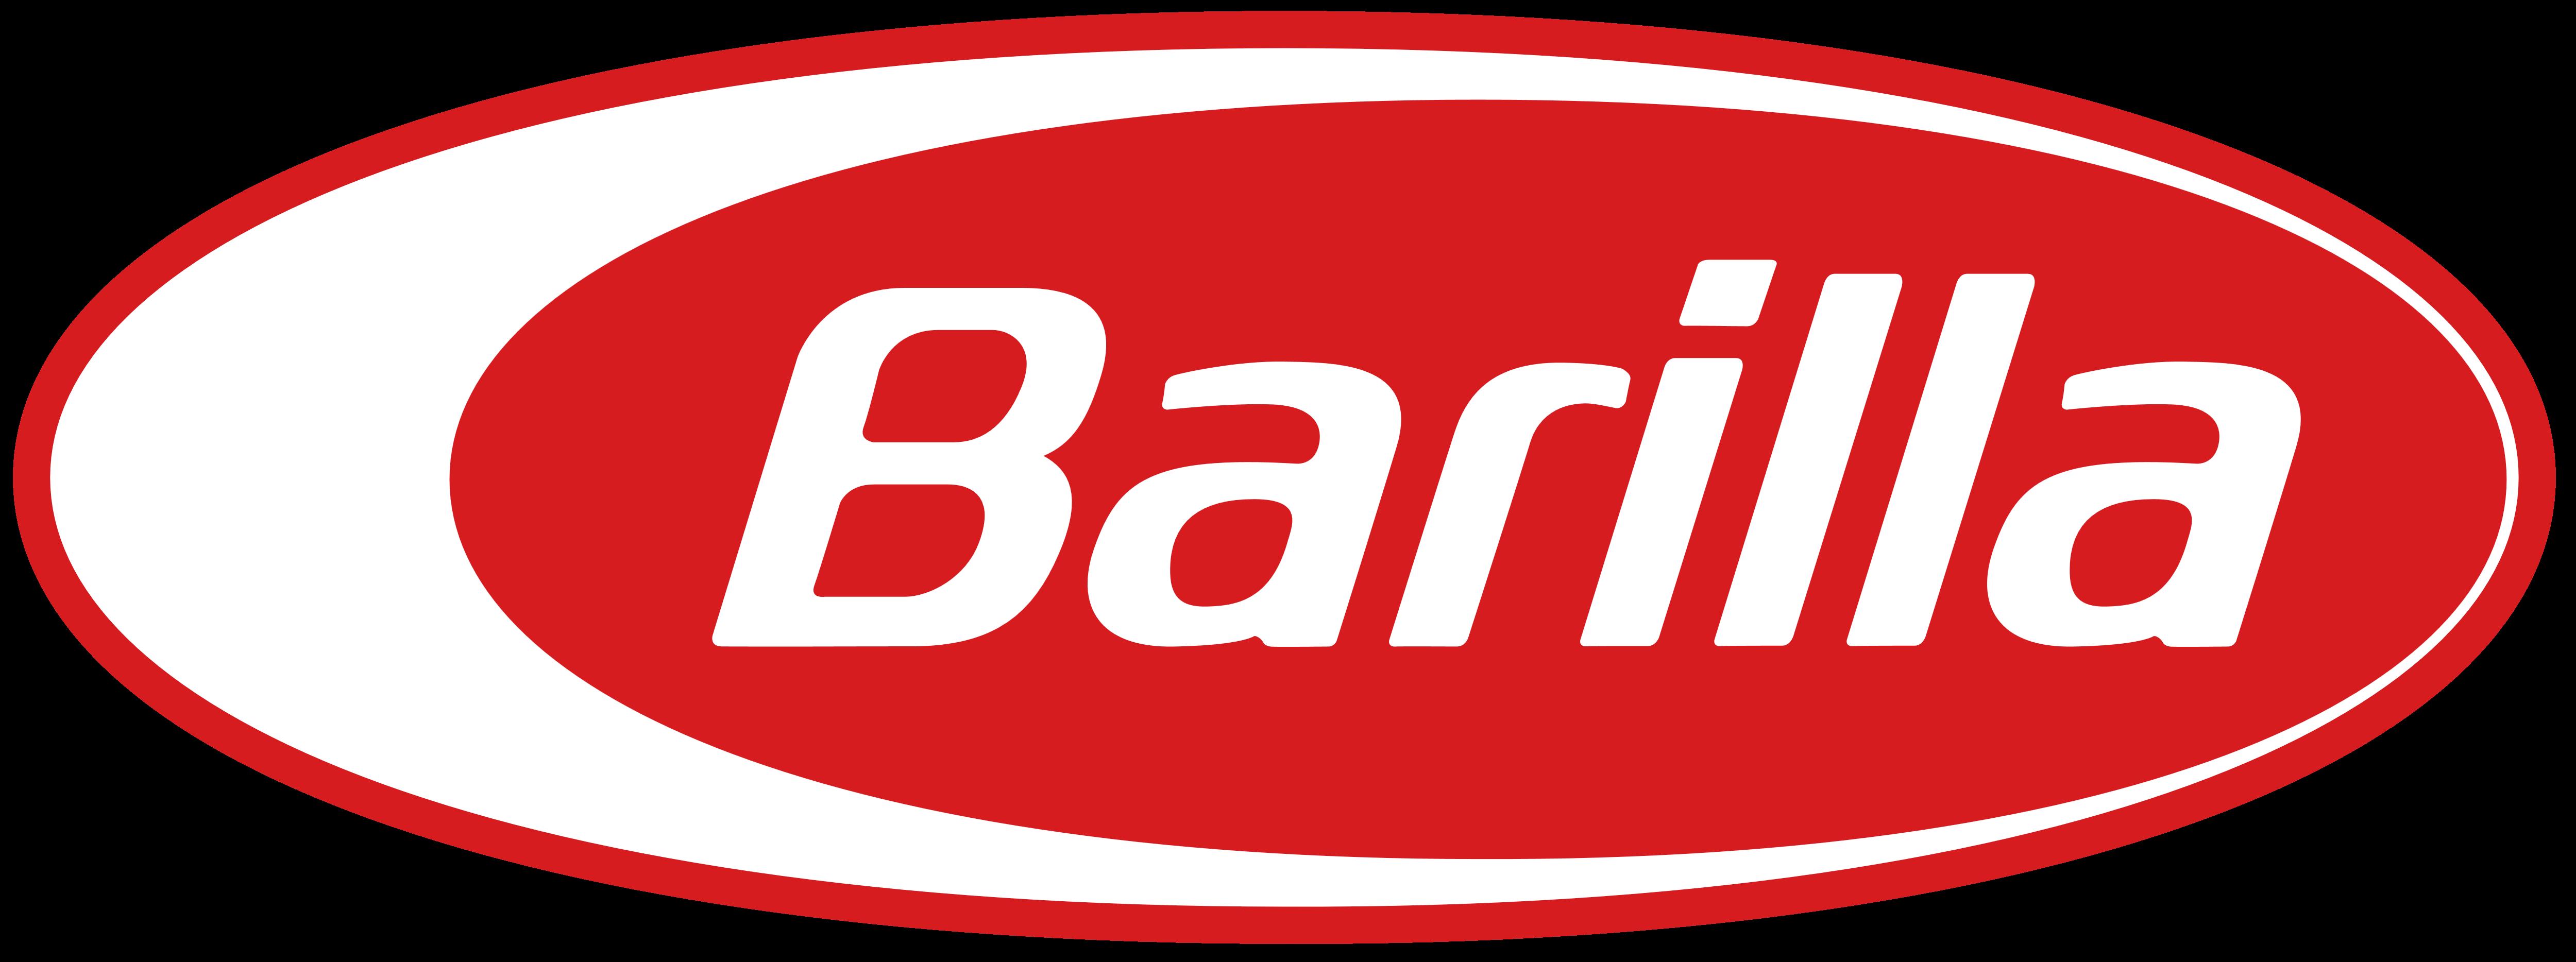 https://www.barilla.com/nn-no